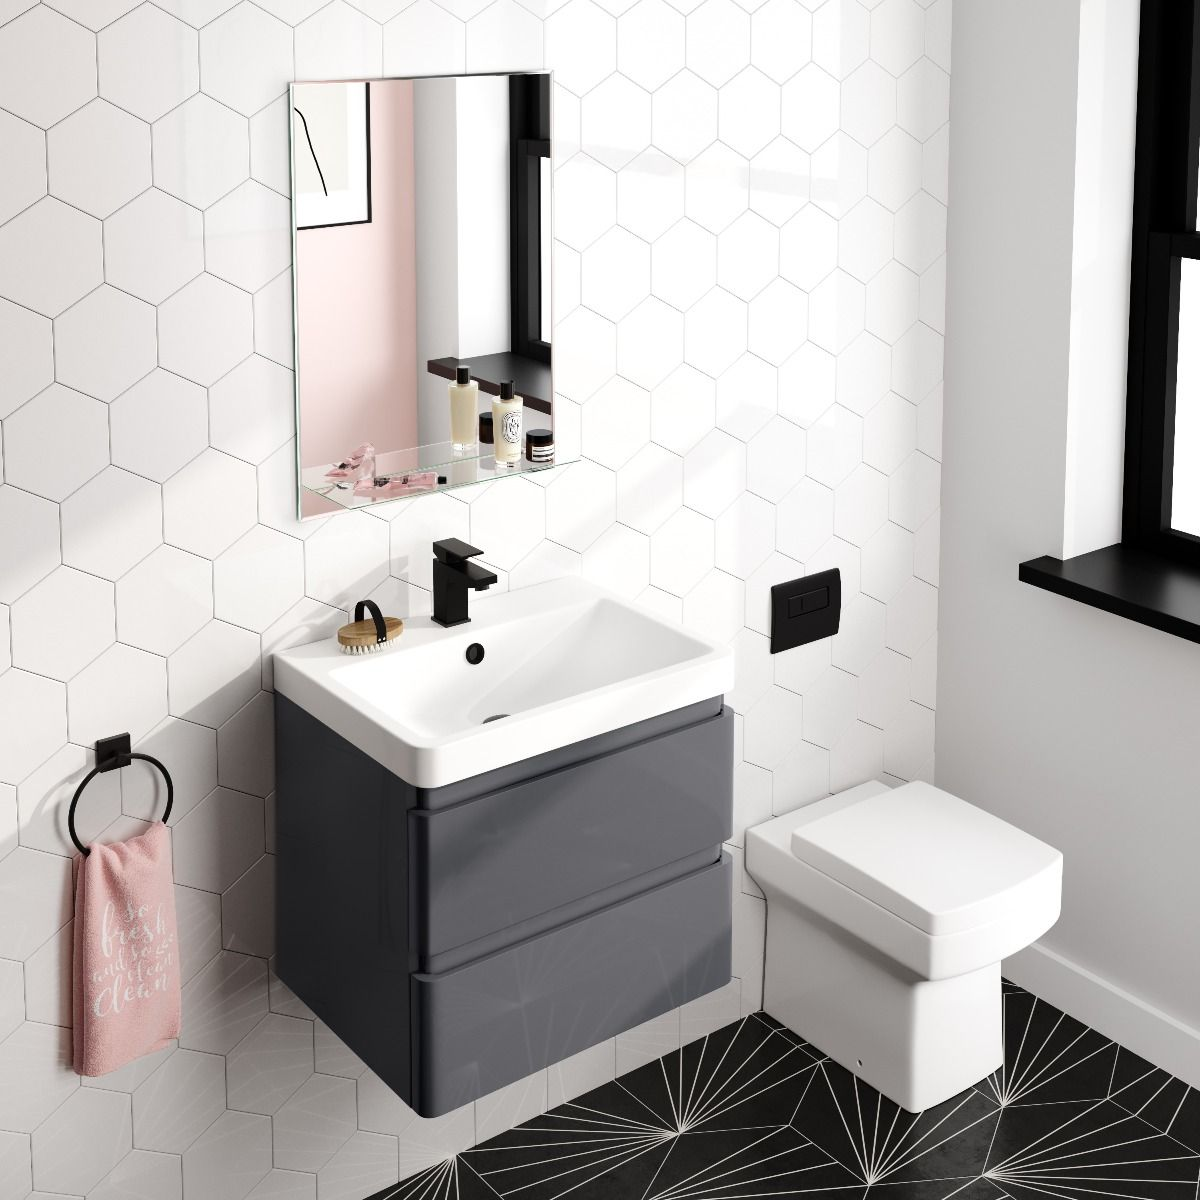 Ava Bevelled Edge Bathroom Mirror With Glass Shelf 700x500mm Bathroom Mountain